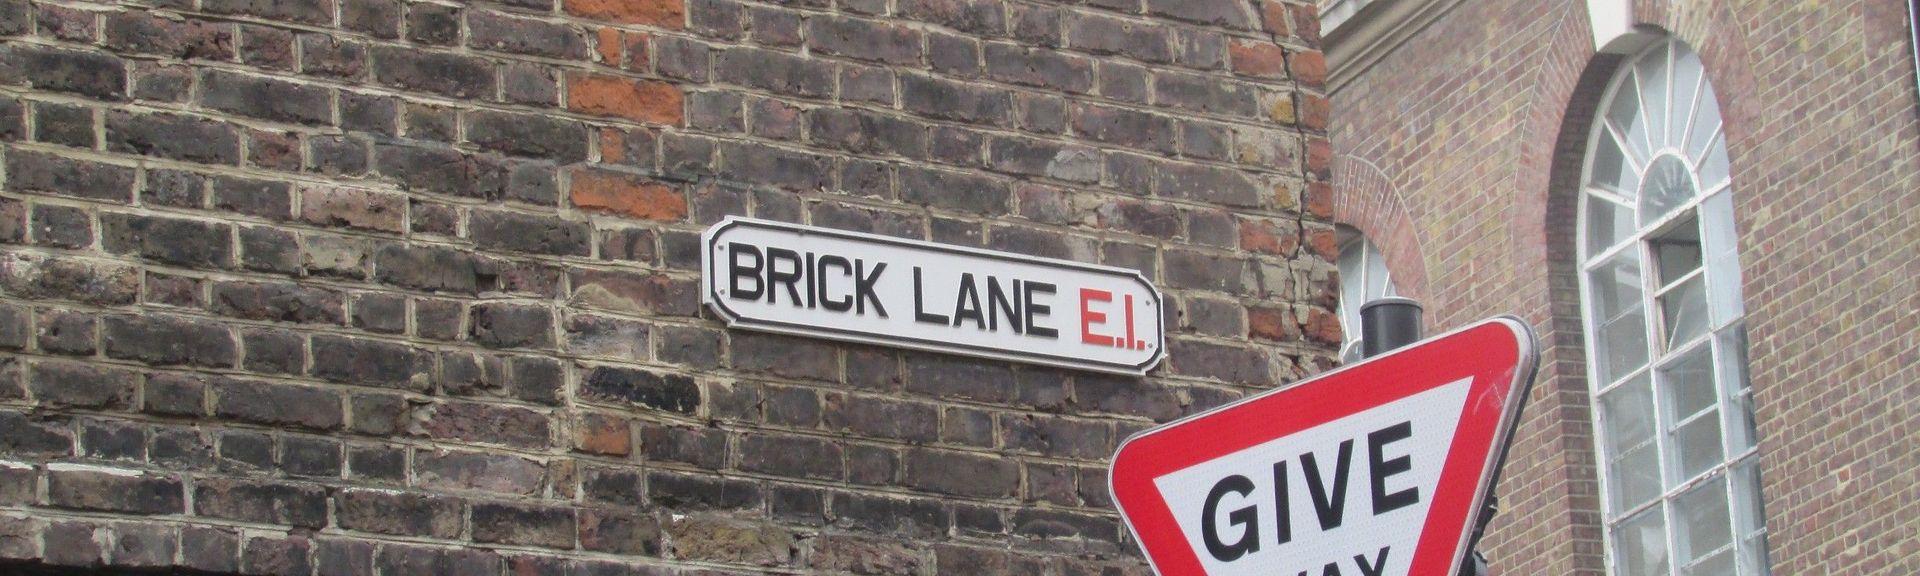 Spitalfields, London, England, Storbritannien